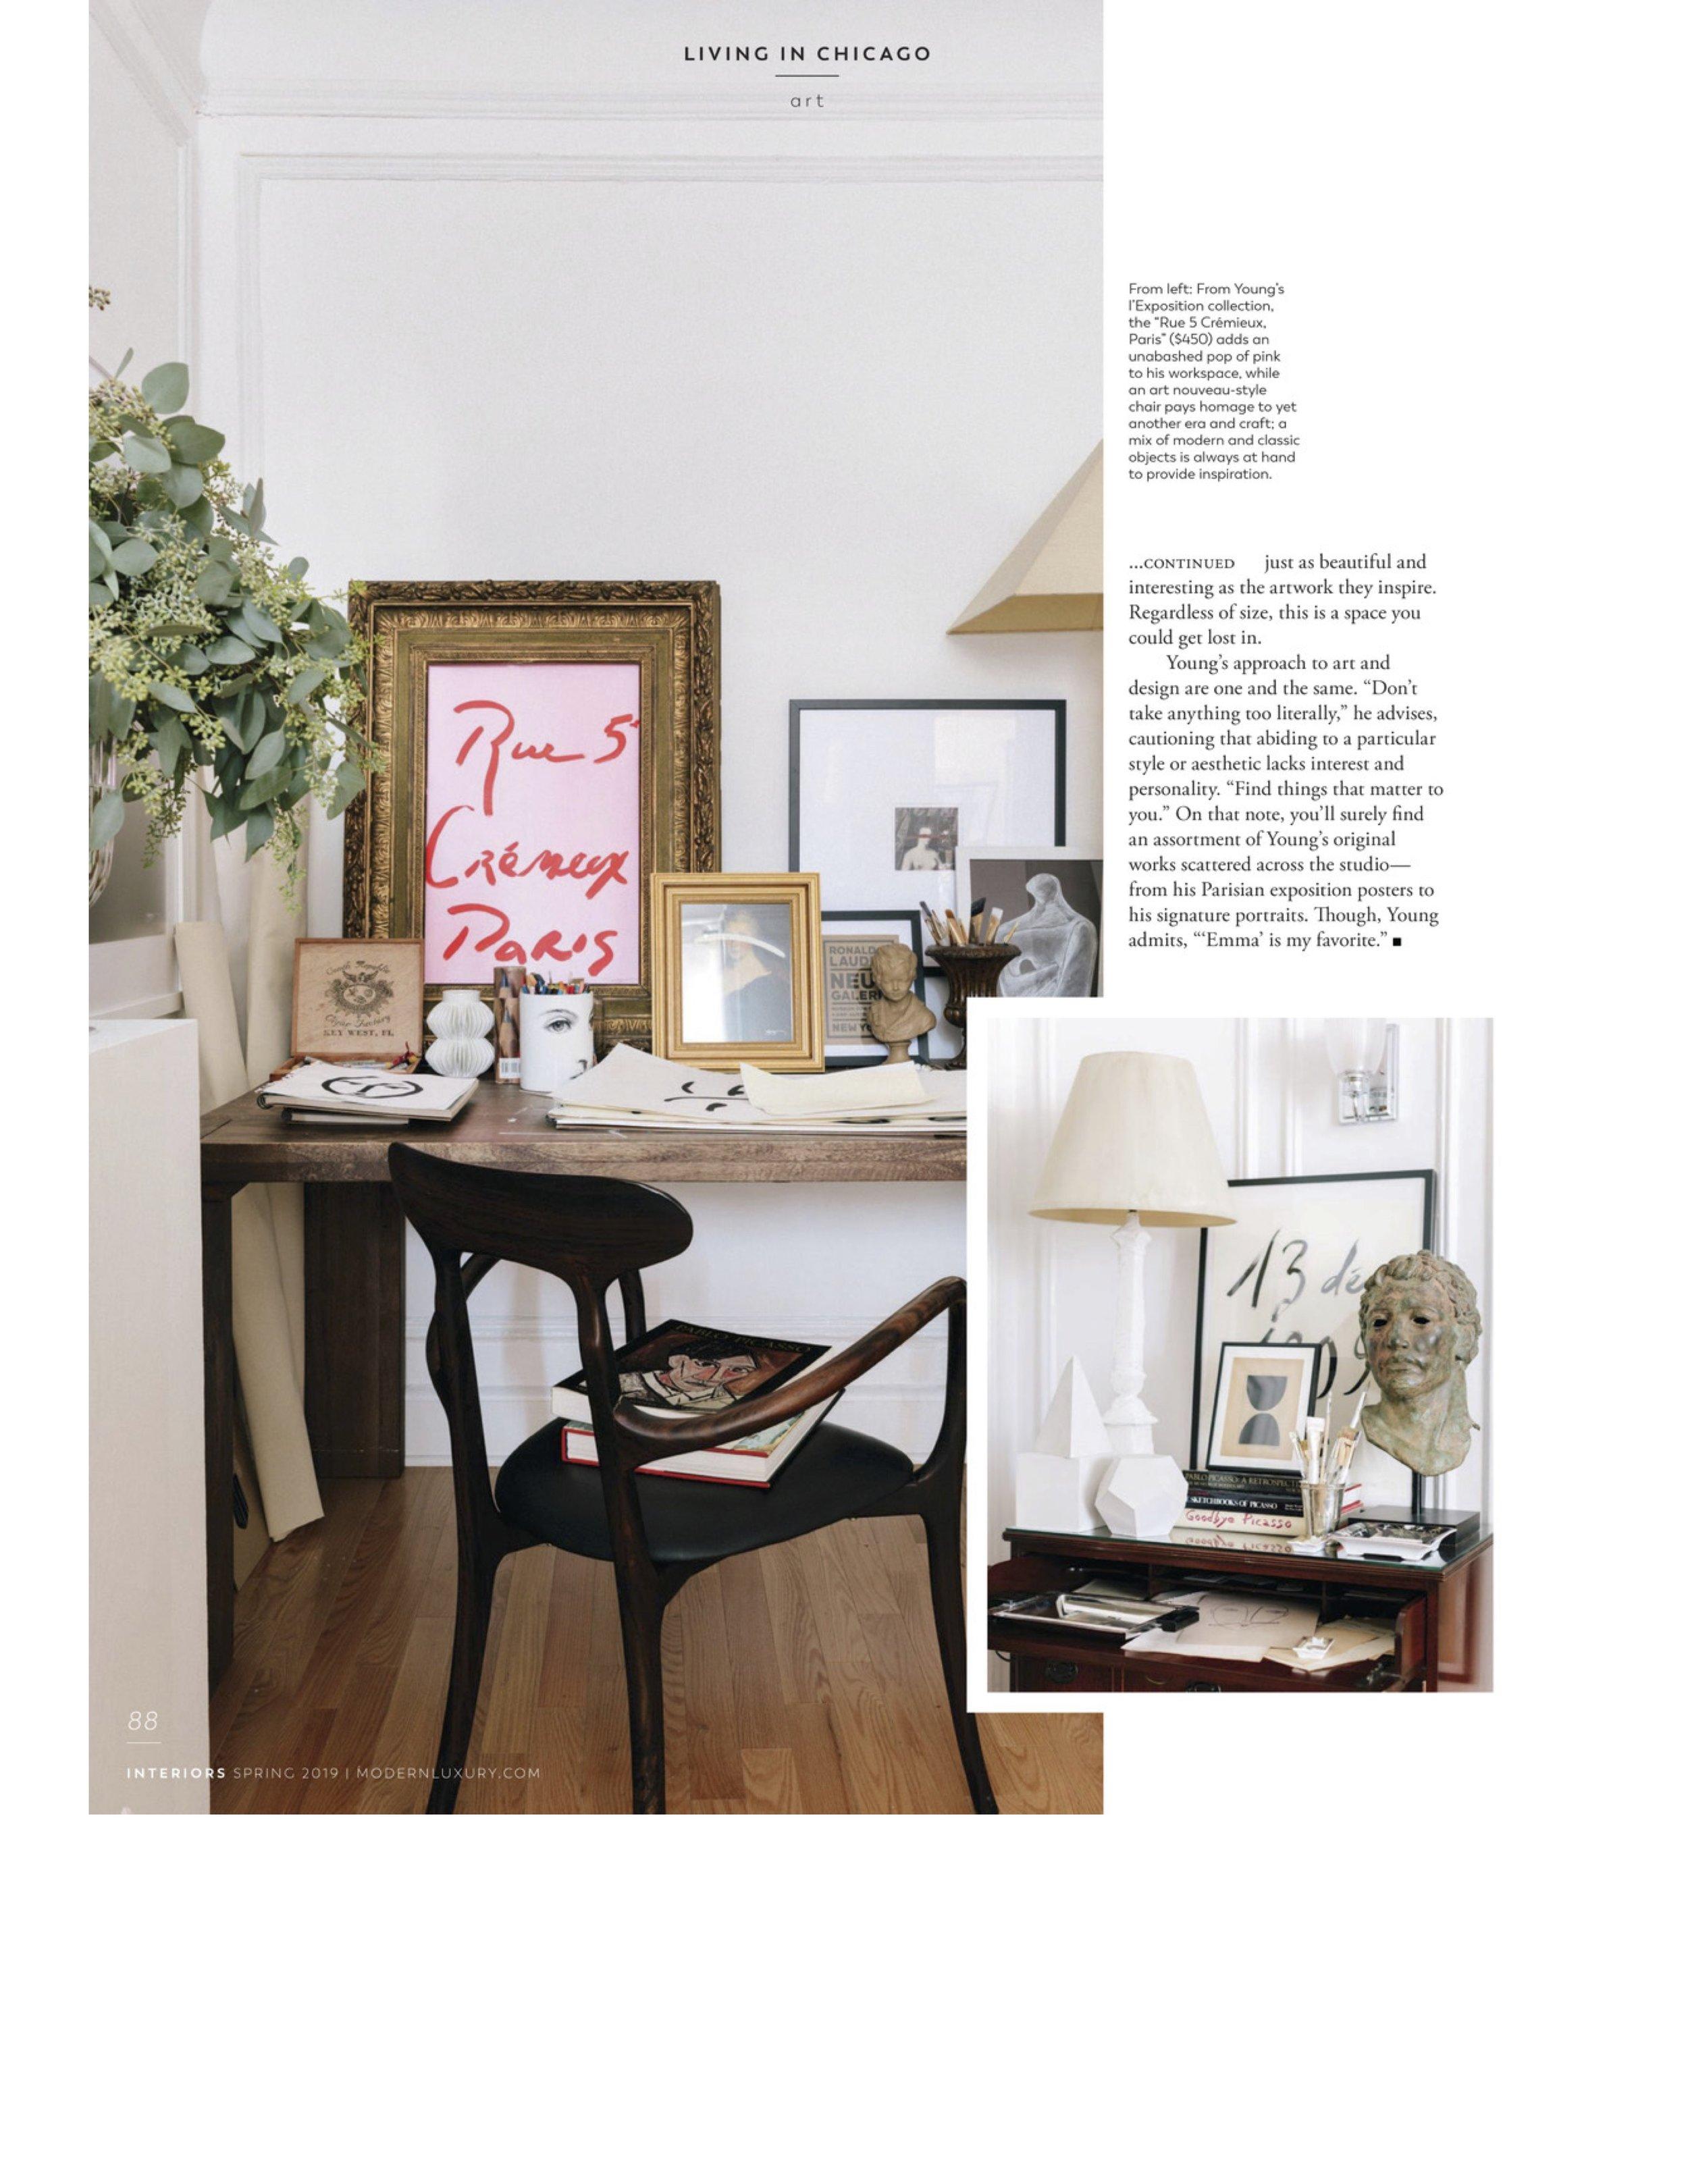 6 Modern Luxury Interiors Chicago Digital Edition | Modern Luxury.jpg